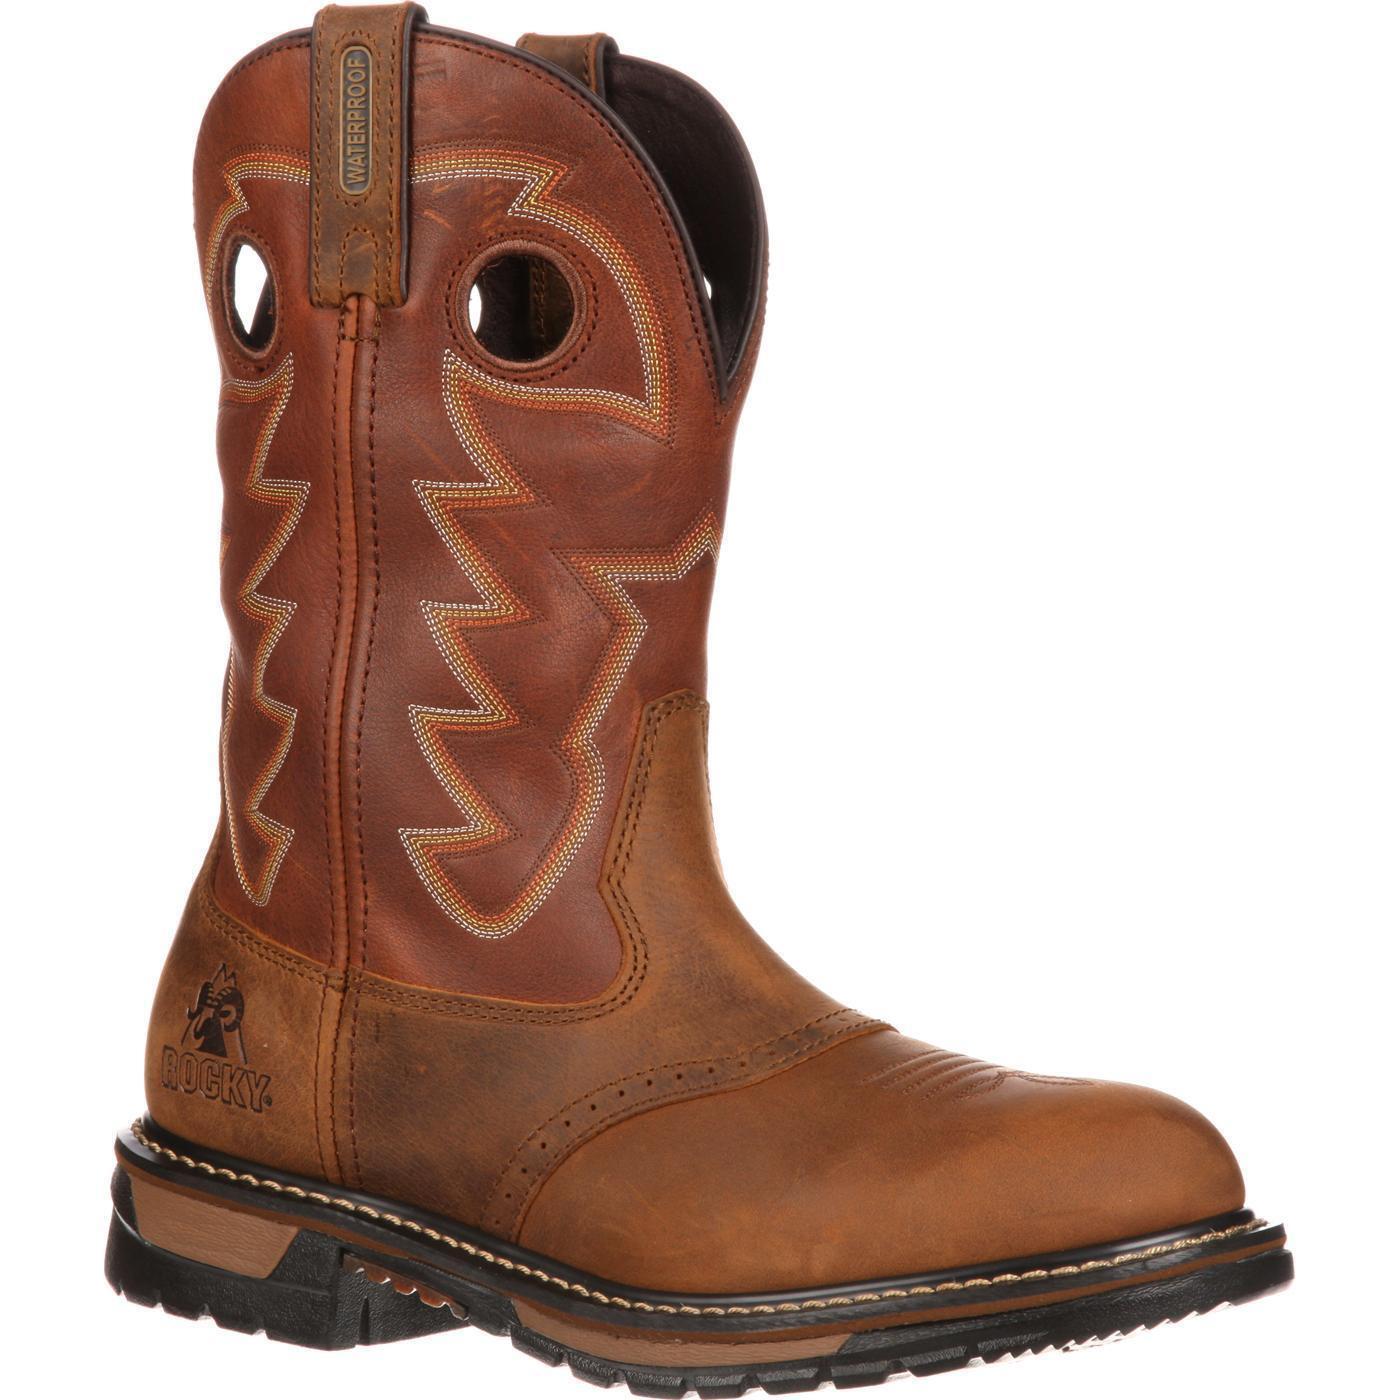 Rocky 2775 Original Ride Branson Saddle Saddle Saddle Leather Pull On Roper Western Work Stiefel 3f23b2